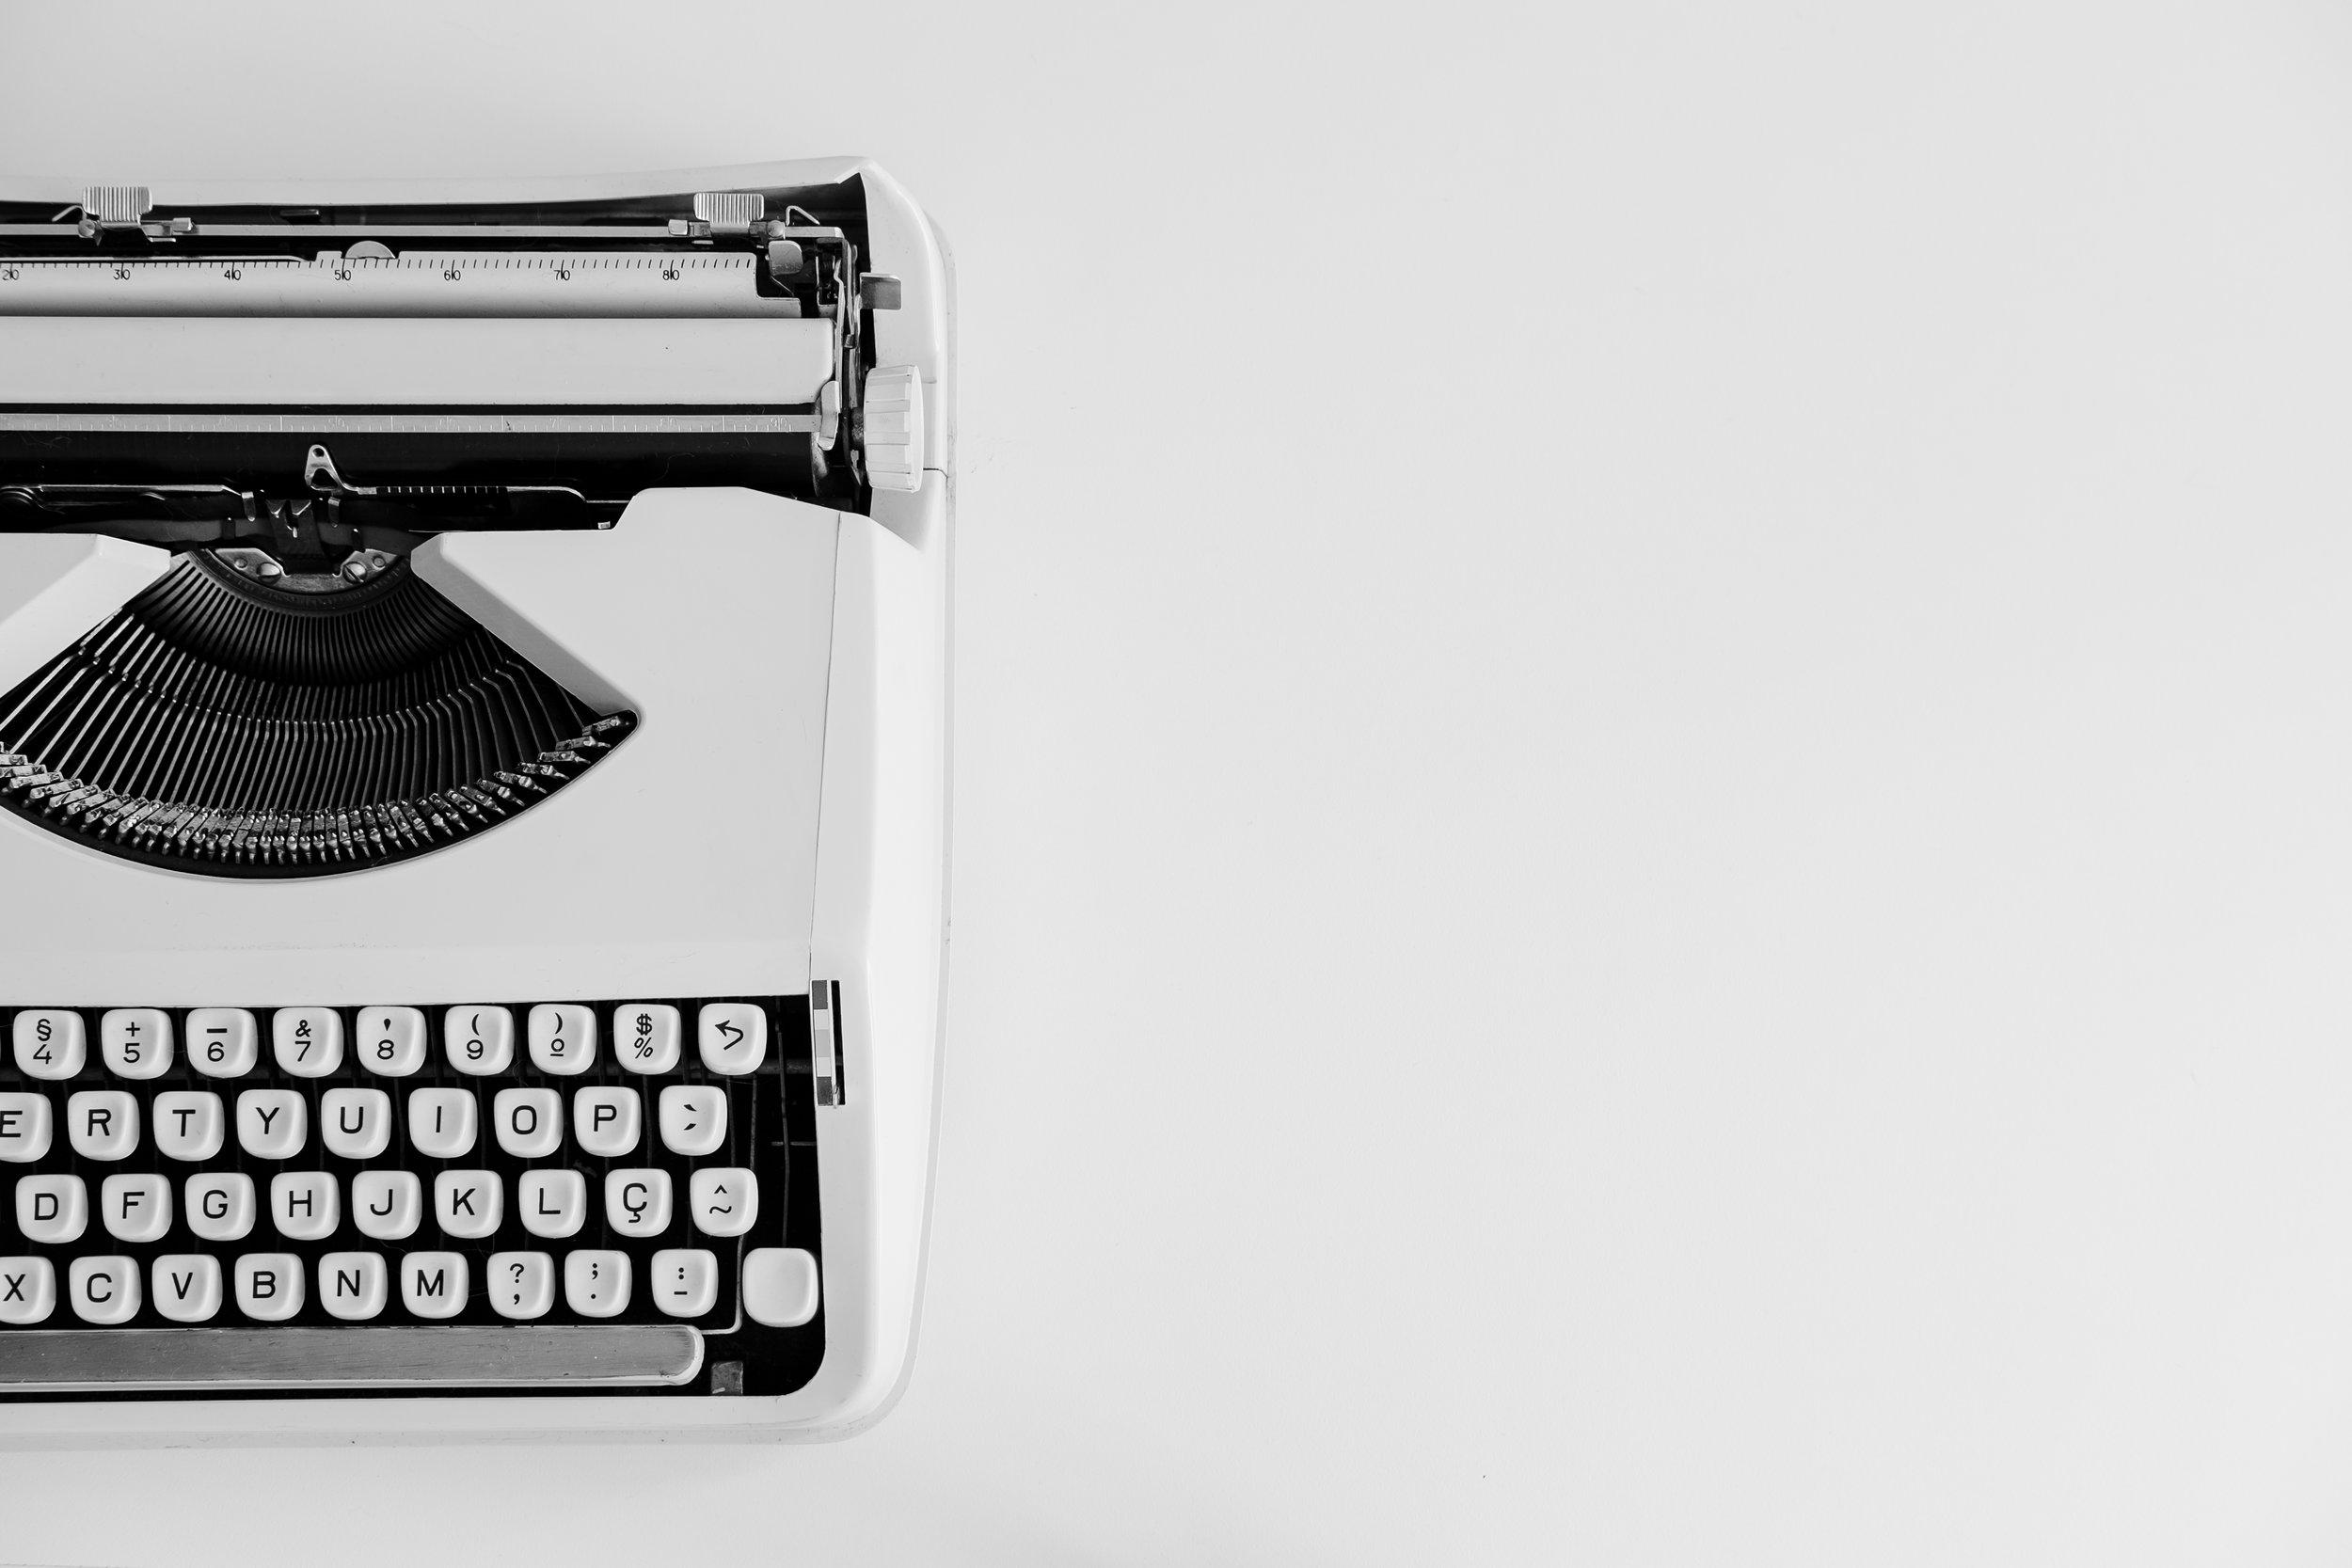 Blog - Be inspirered!Leuke en inspirerende blogs lezen over (online) ondernemen